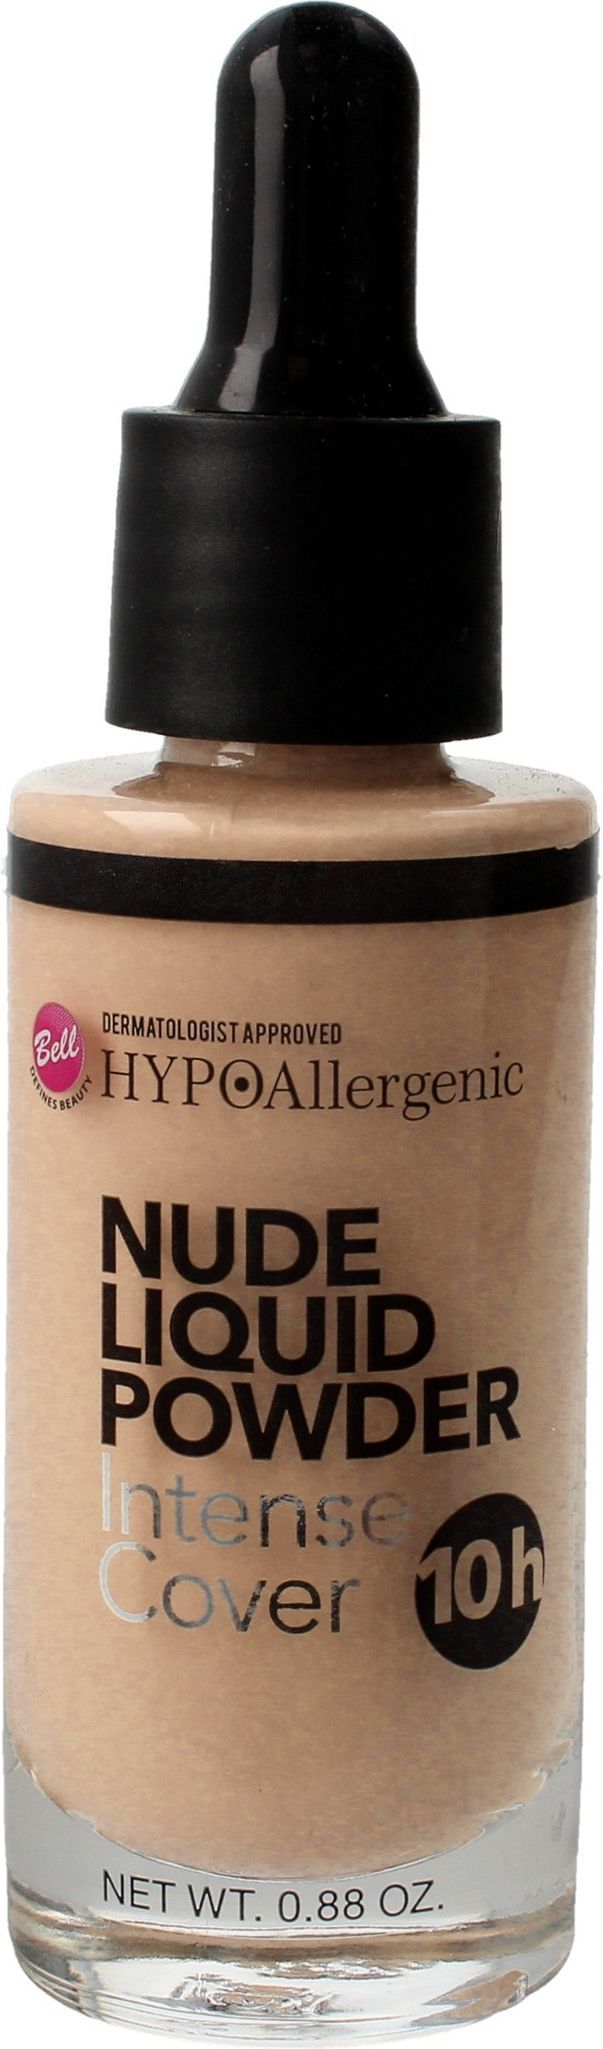 BELL Puder w płynie Nude Liquid Powder 02 Light Beige 25g 1